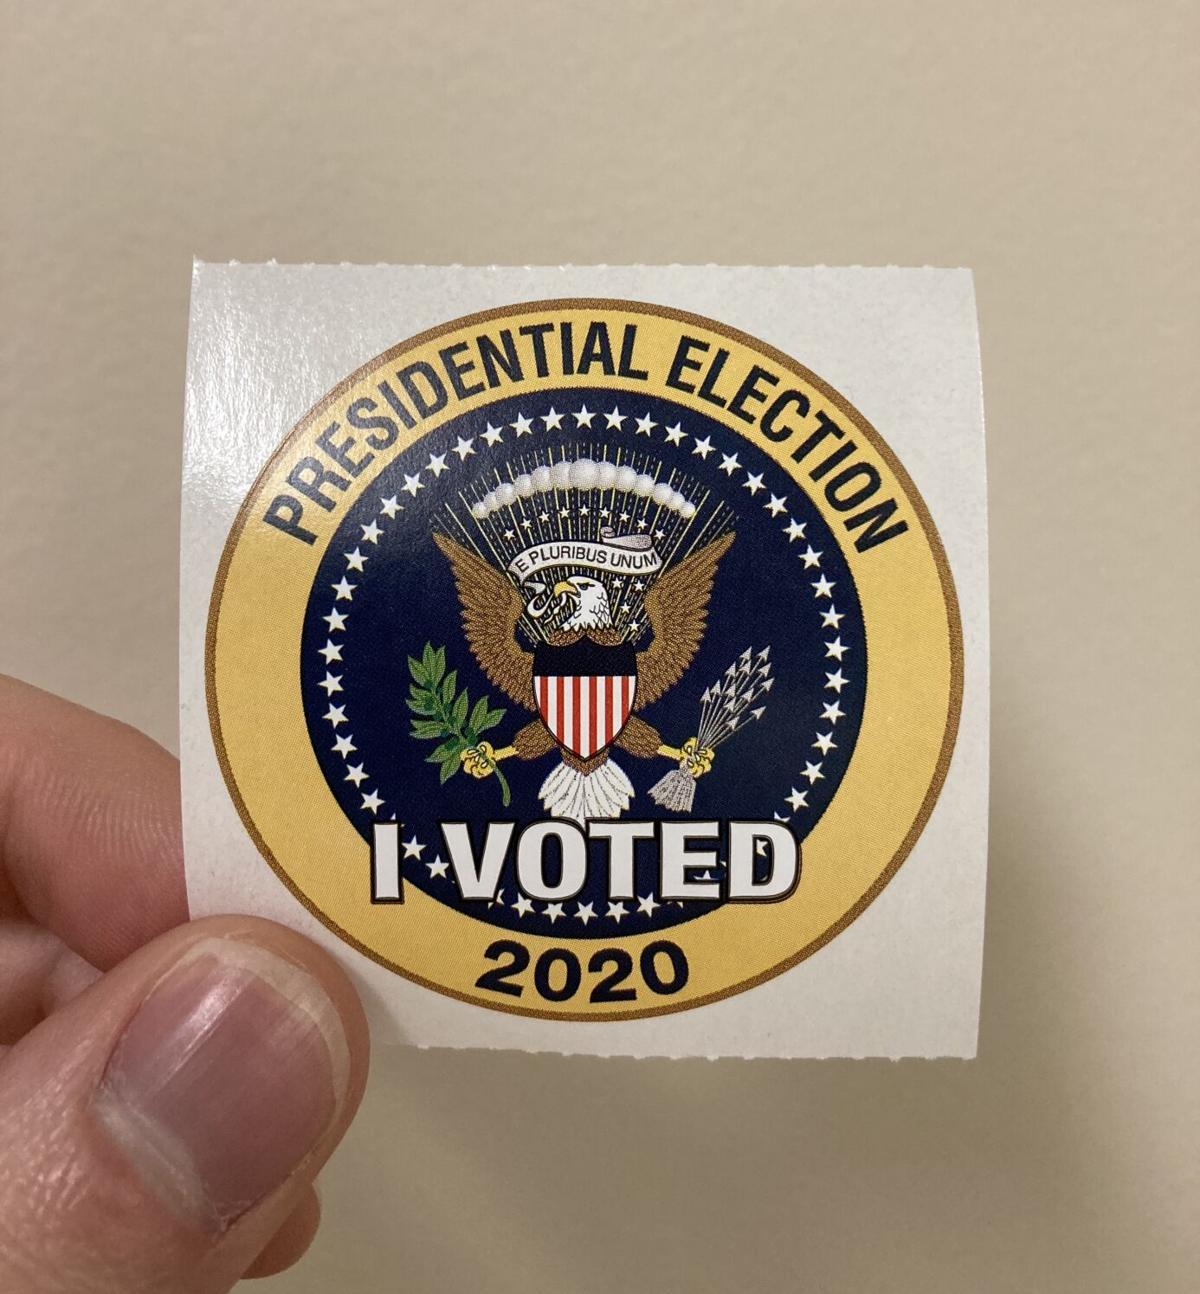 Voter registration photo illustration